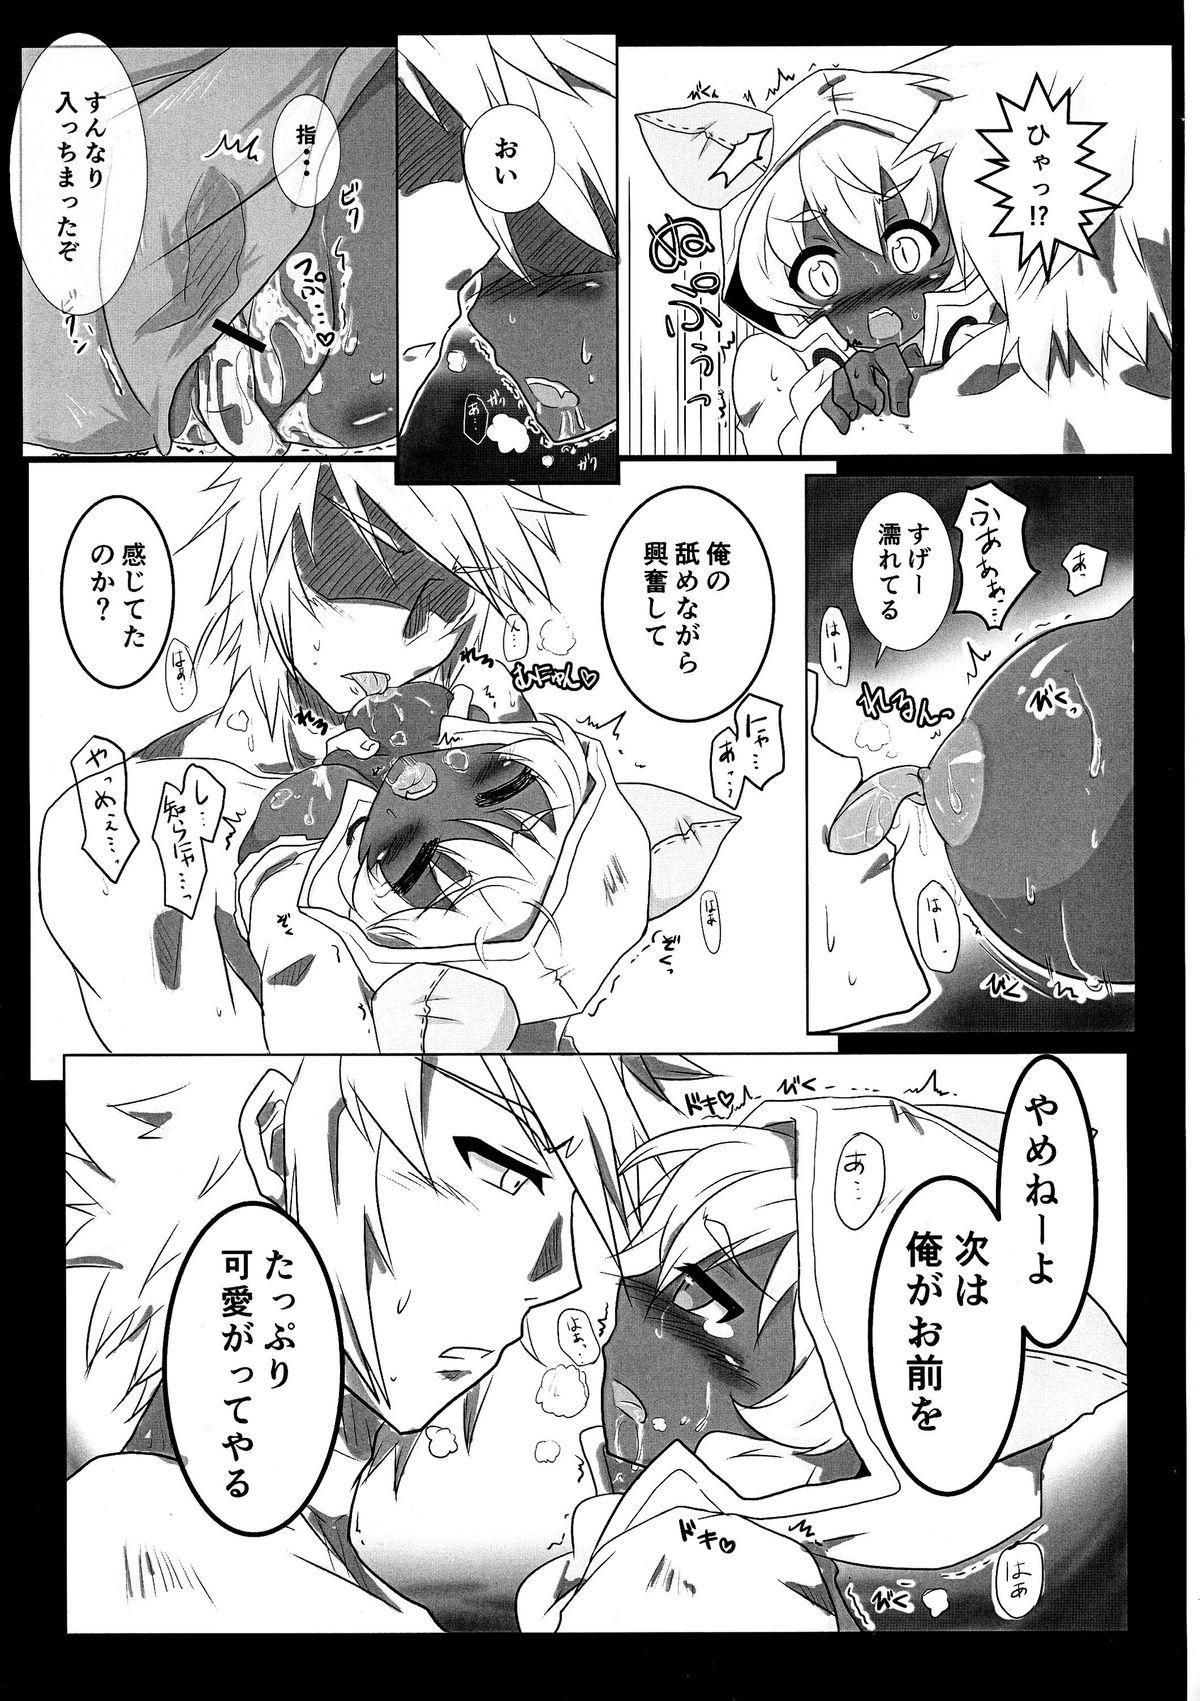 Tao no Ongaeshi 22